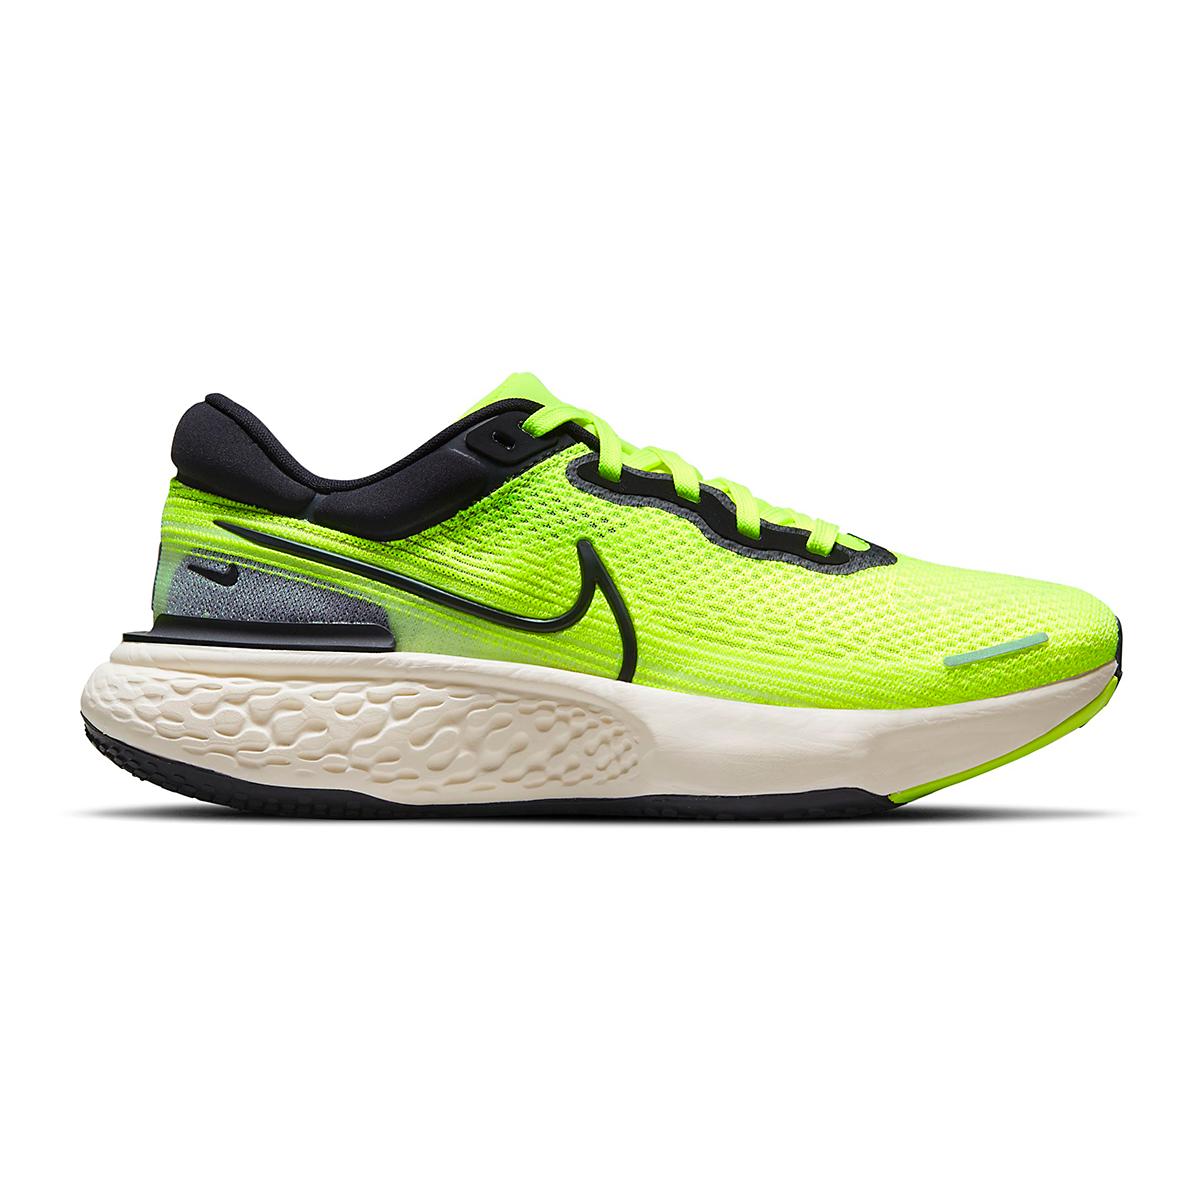 Men's Nike Zoomx Invincible Run FlyKnit Running Shoe - Color: Volt/Black/Barely Volt - Size: 6 - Width: Regular, Volt/Black/Barely Volt, large, image 1